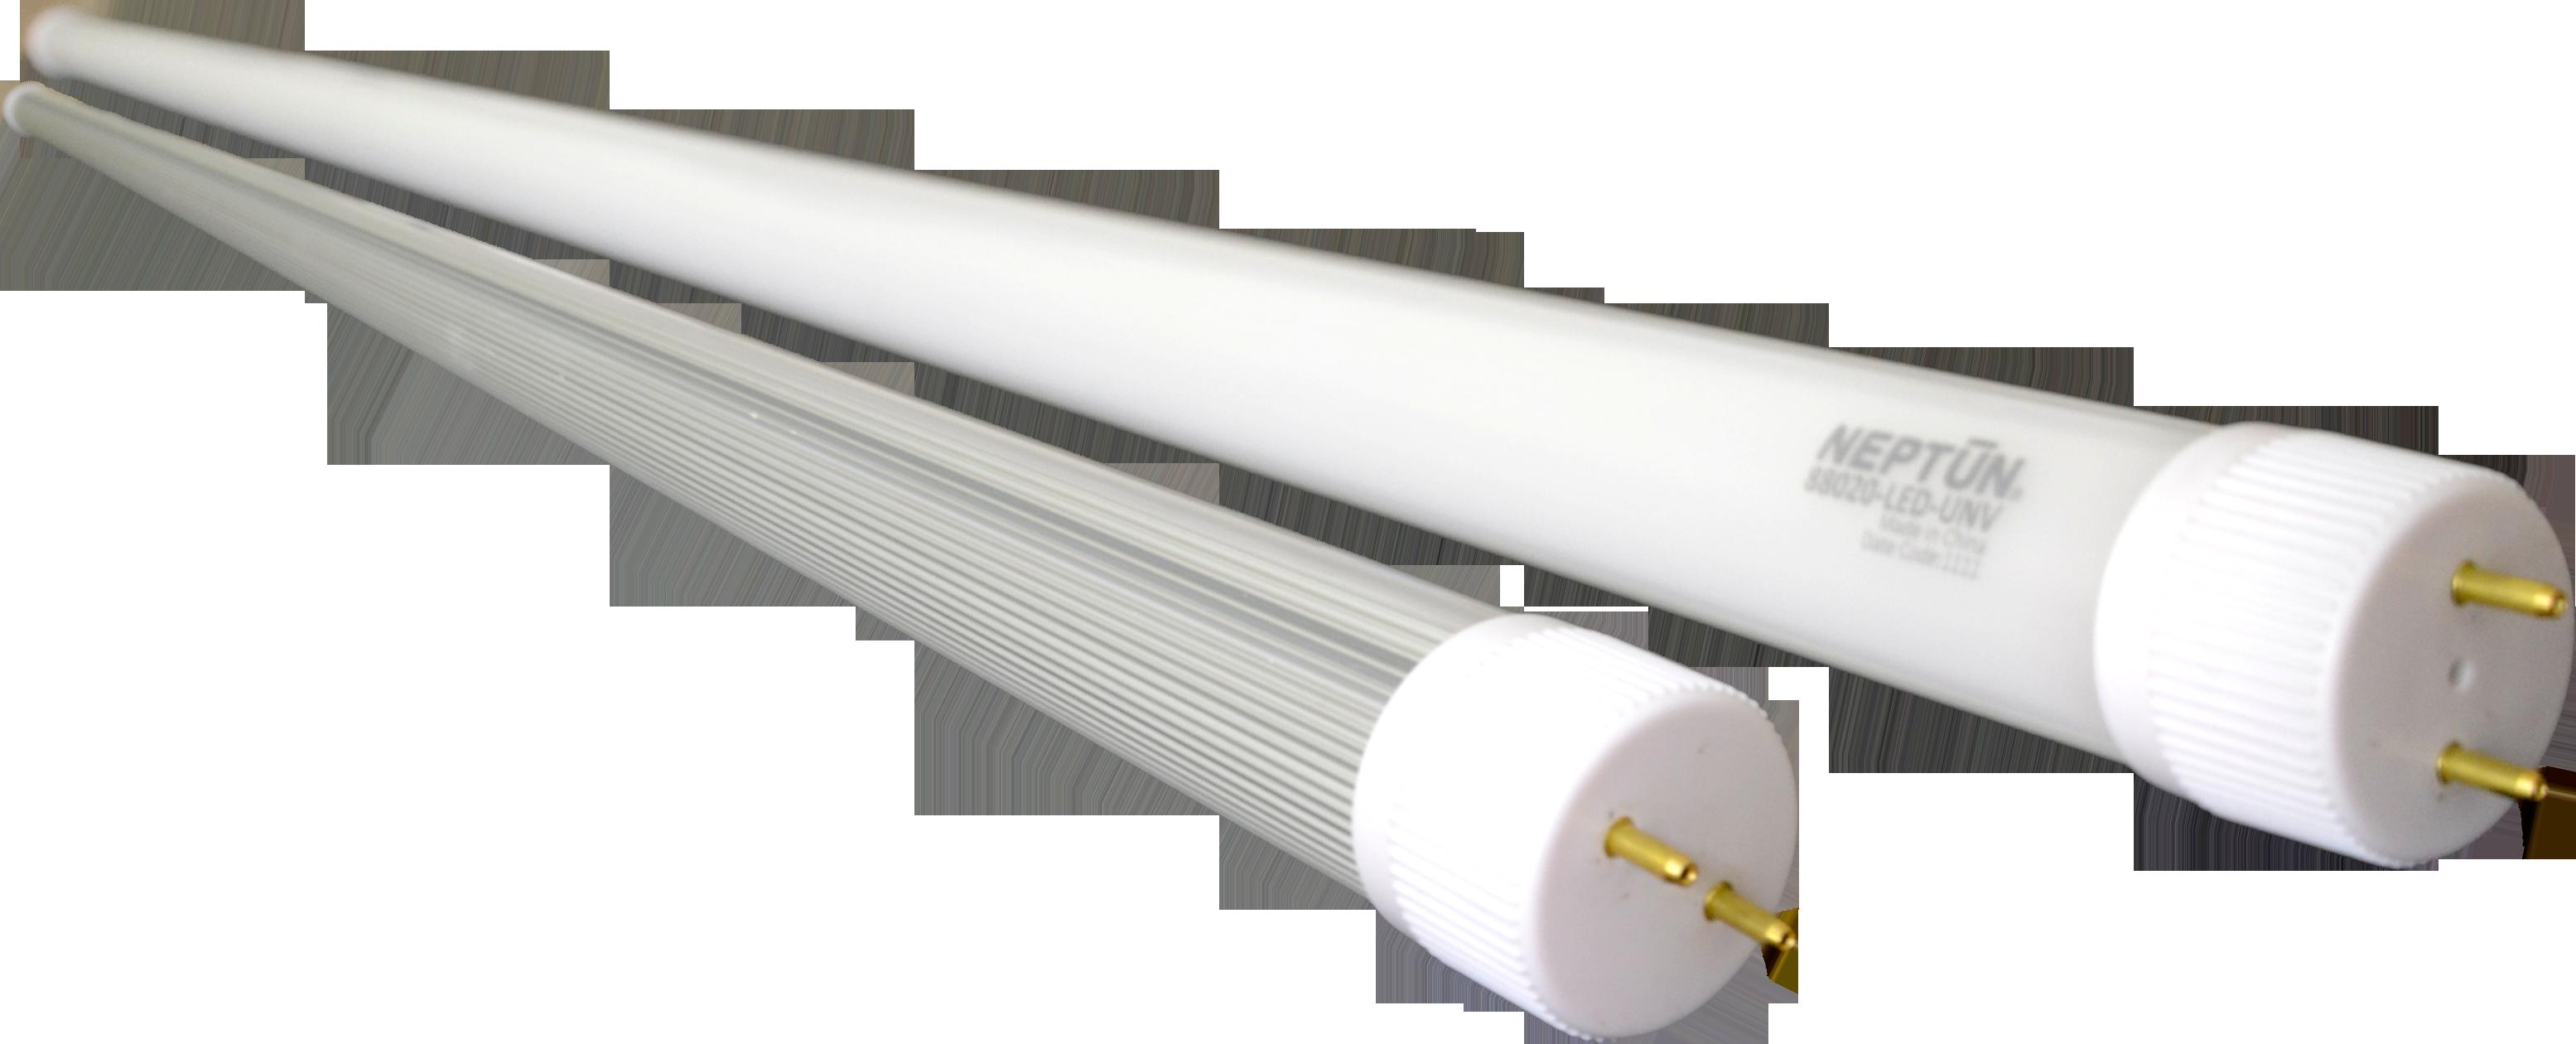 neptun led 88026 unv led 4 foot 26 watt t8 tube light. Black Bedroom Furniture Sets. Home Design Ideas